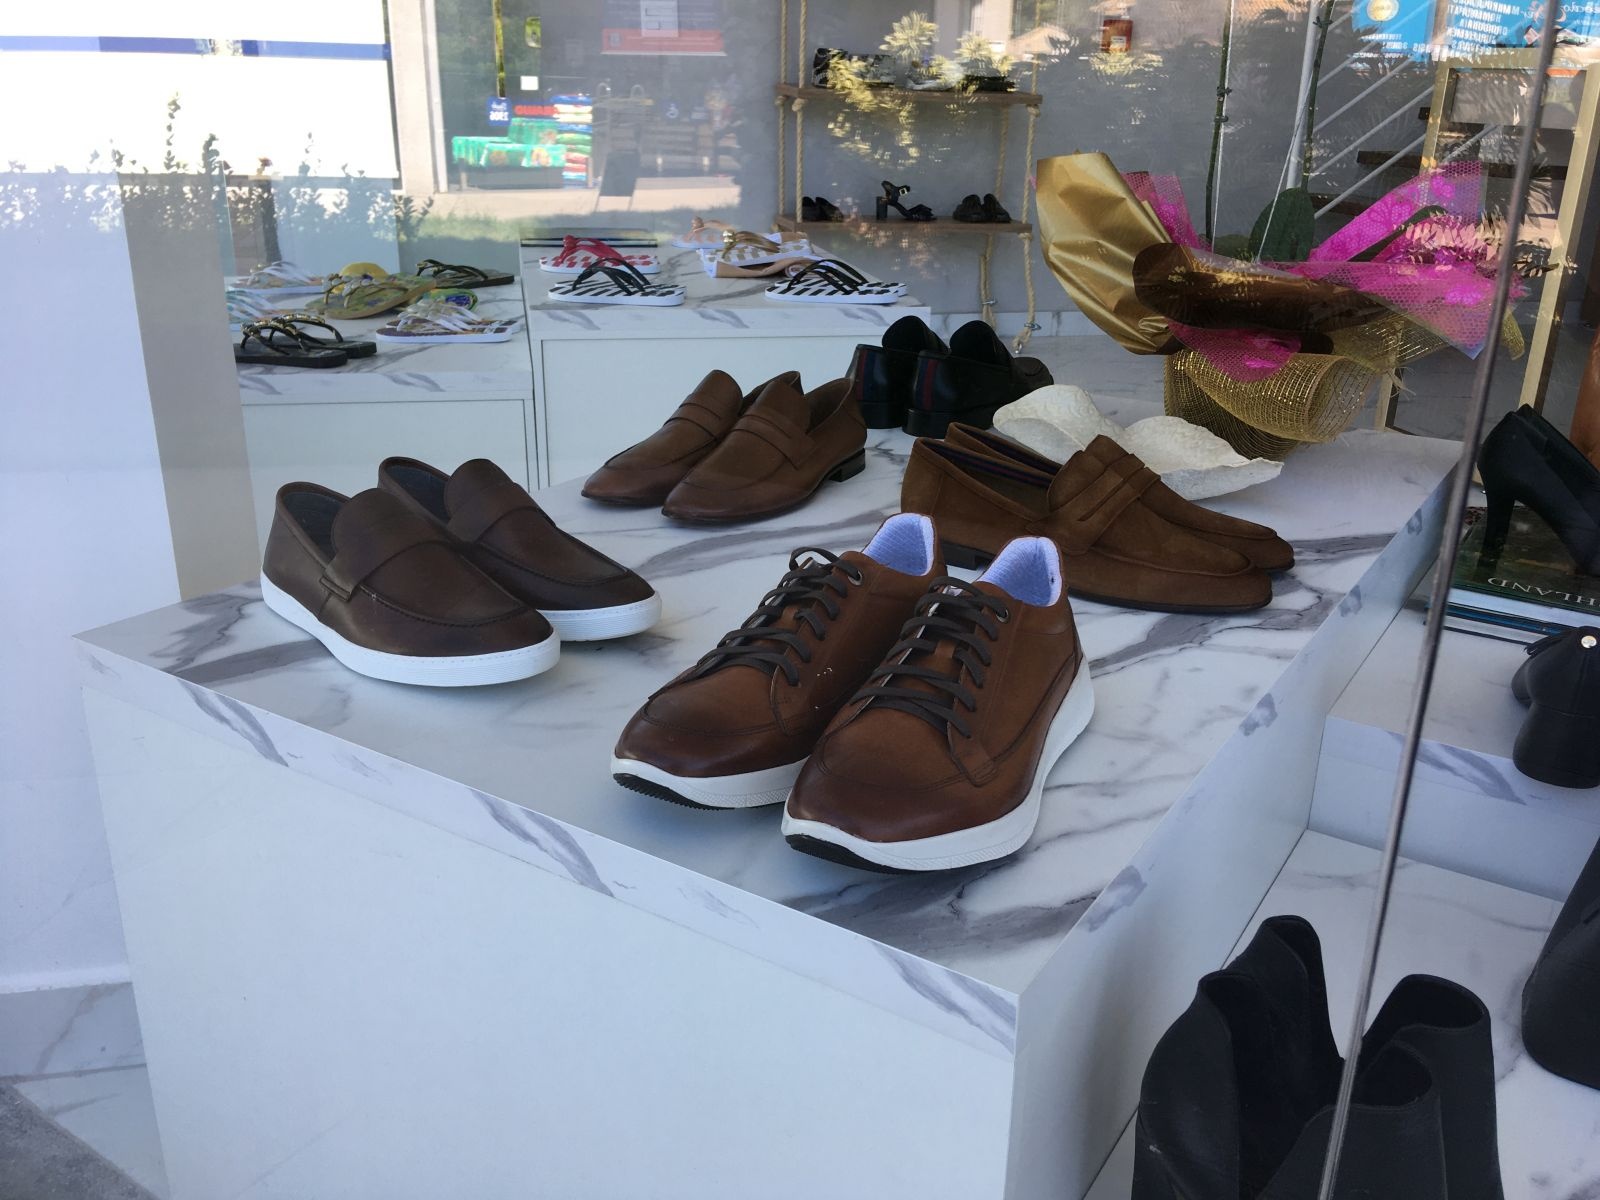 Boutique André Nogues traz novidades para o público masculino da cidade